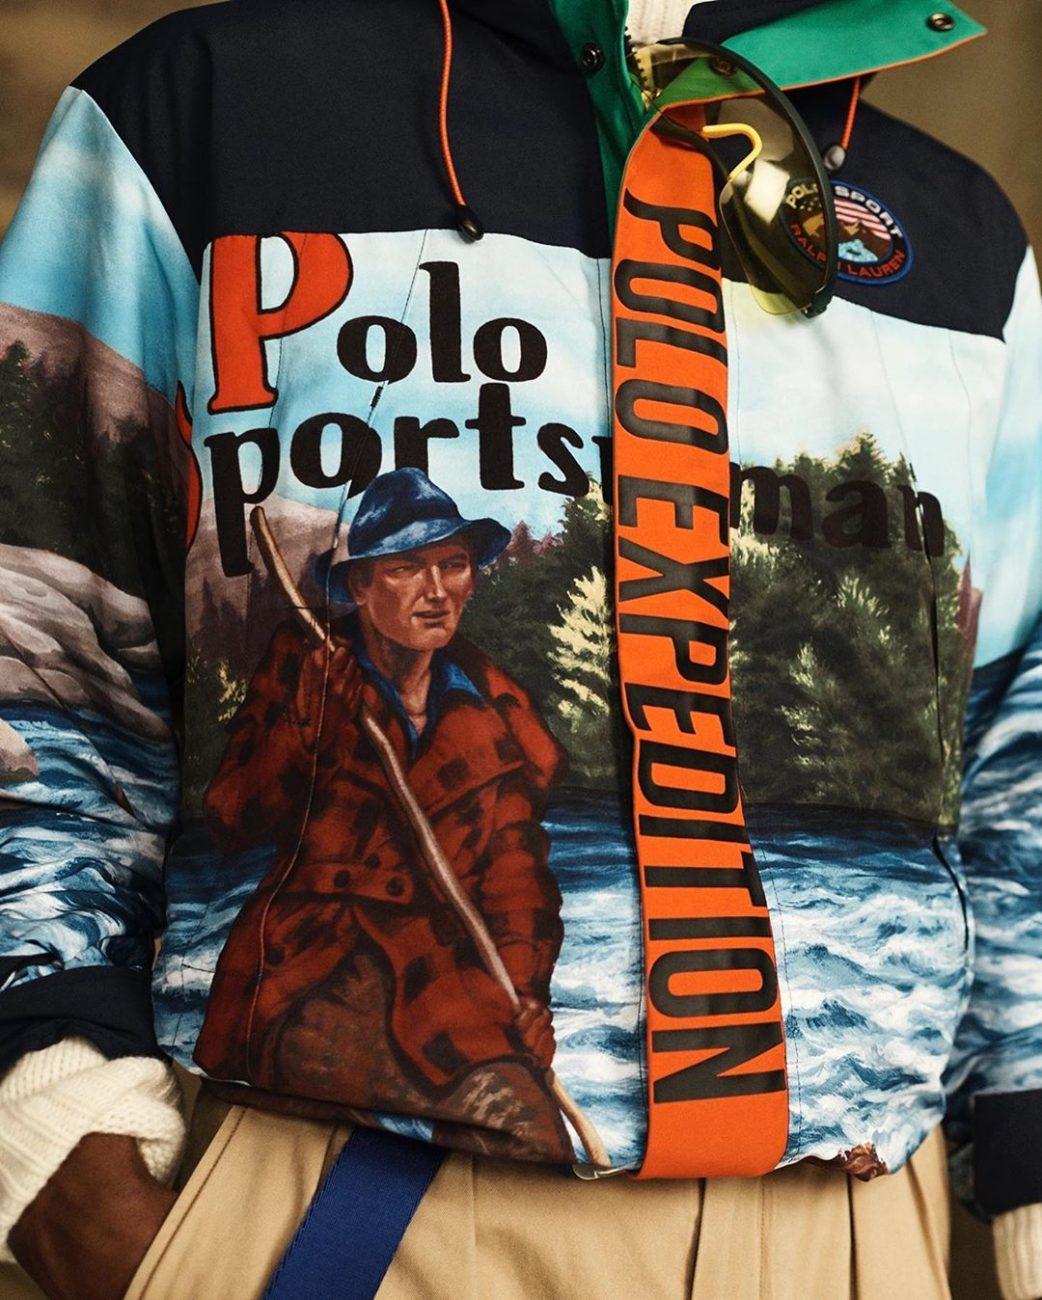 https:/ralph-lauren-polo-sport-outdoors-collection-2